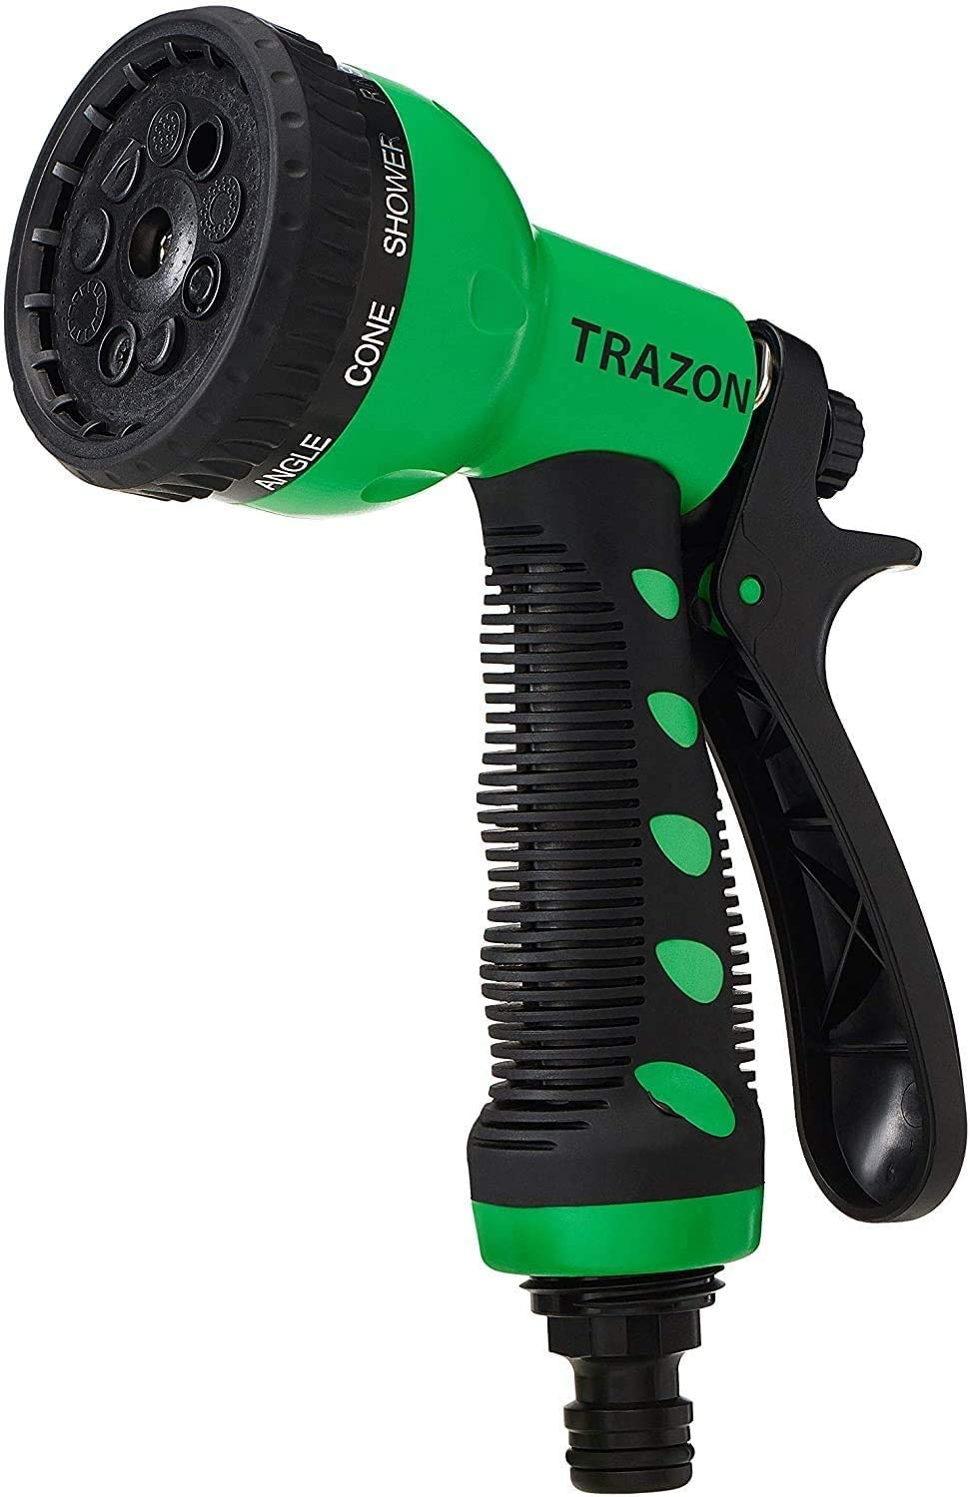 Garden Hose Nozzle Heavy Duty, High Pressure. Water Hose Nozzle Sprayer, Gun, Head. Spray Nozzle for Garden Hose, 9 Adjustable Watering Patterns, Nozzles for Garden, Lawn, Car Wash